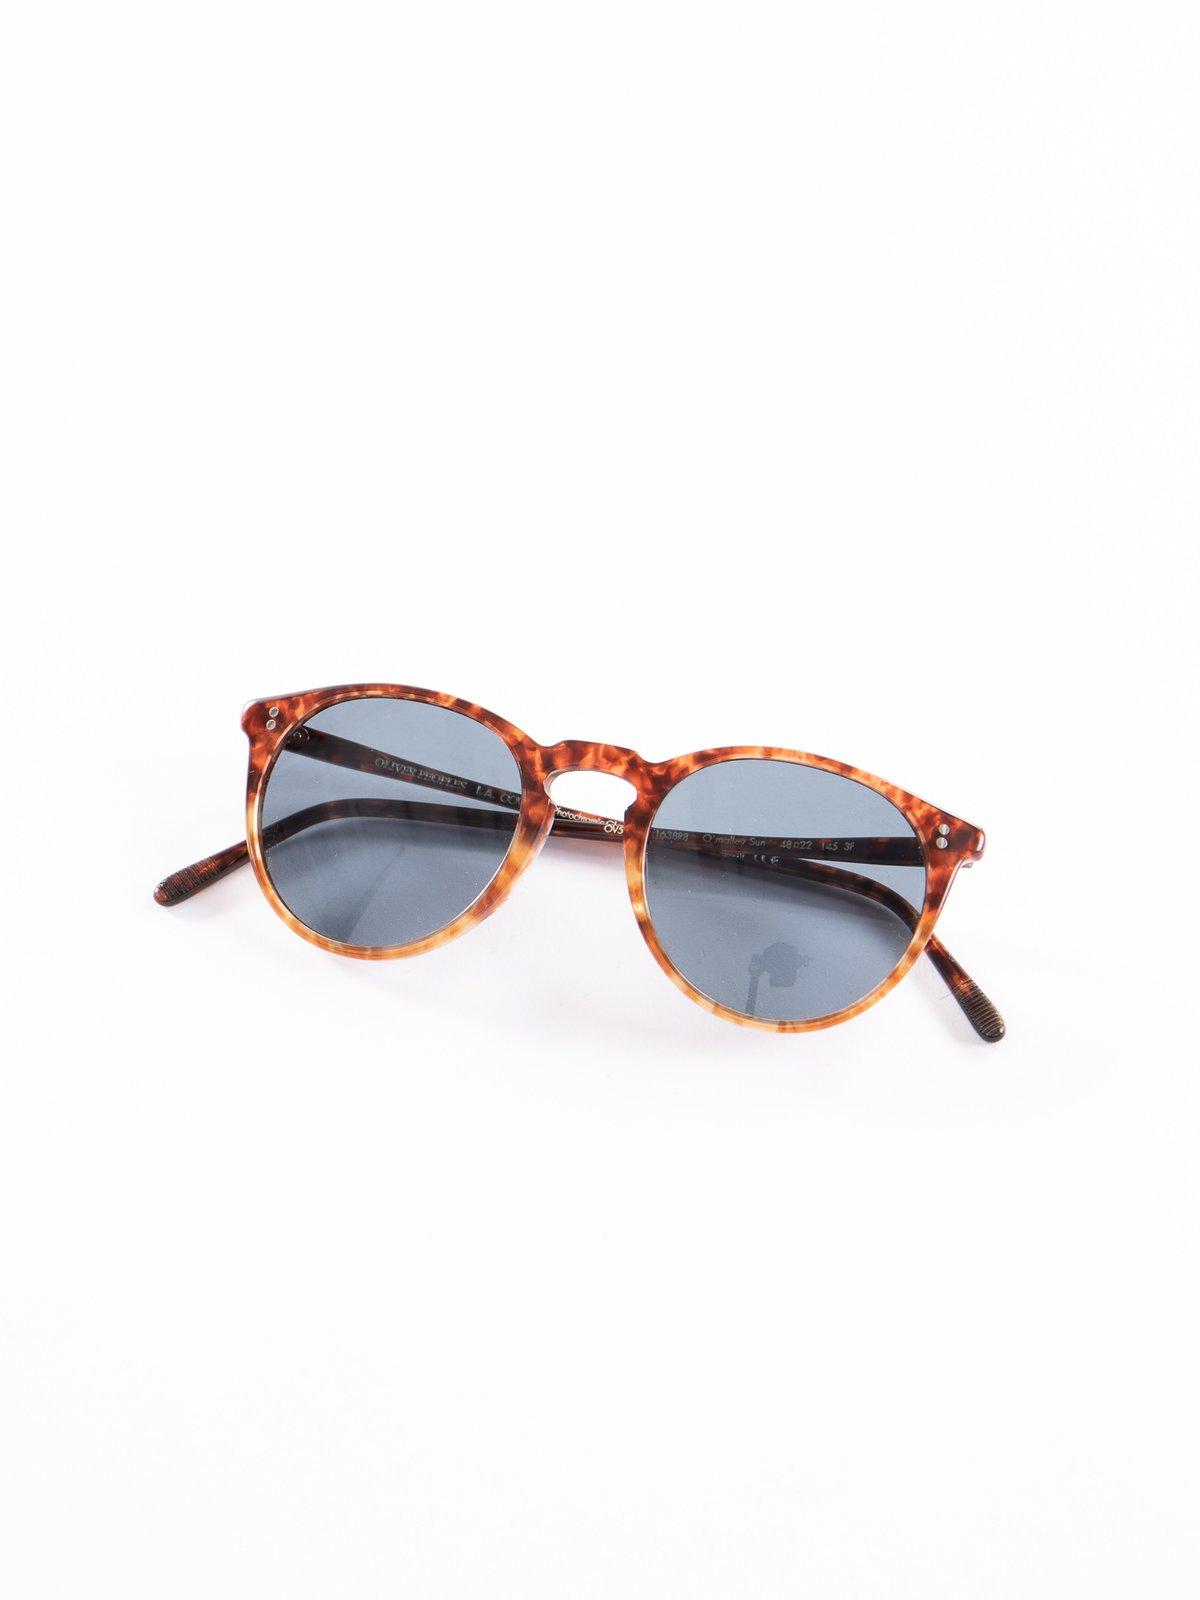 Vintage 1282/Blue Photochromic O'Malley Sunglasses - Image 1